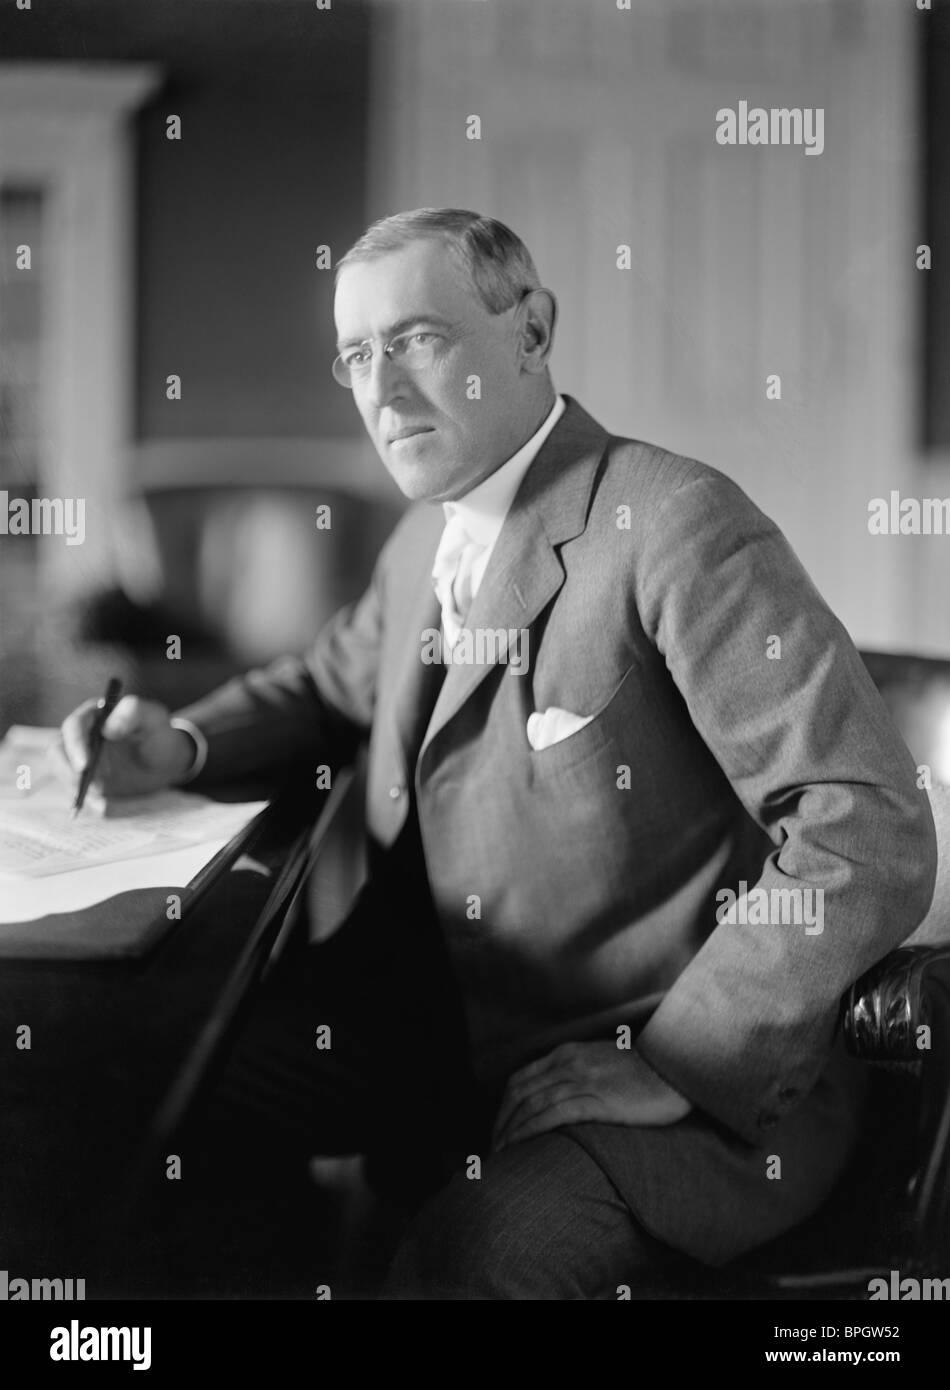 Portrait photo circa 1910s of Woodrow Wilson (1856 - 1924) - the 28th US President (1913 - 1921). - Stock Image